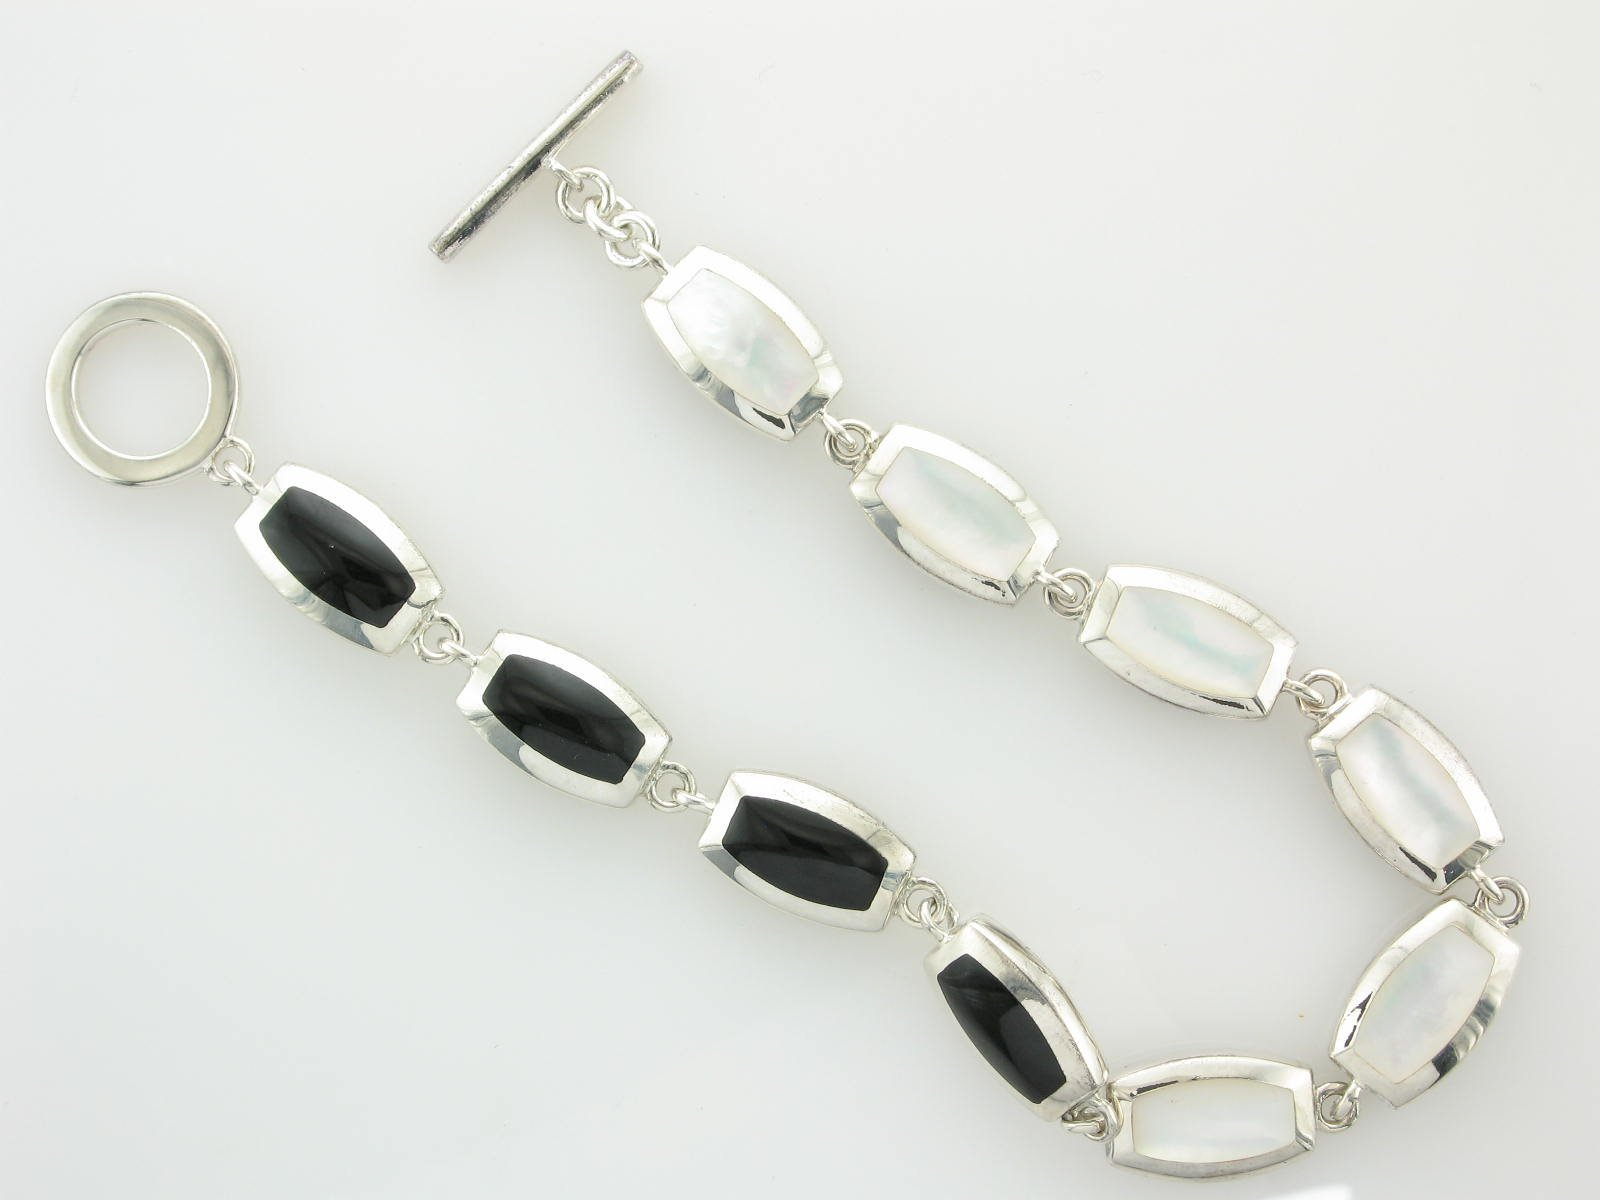 7.5 Onyx & Mother of Pearl Reversable Bracelet set in Sterling Silver